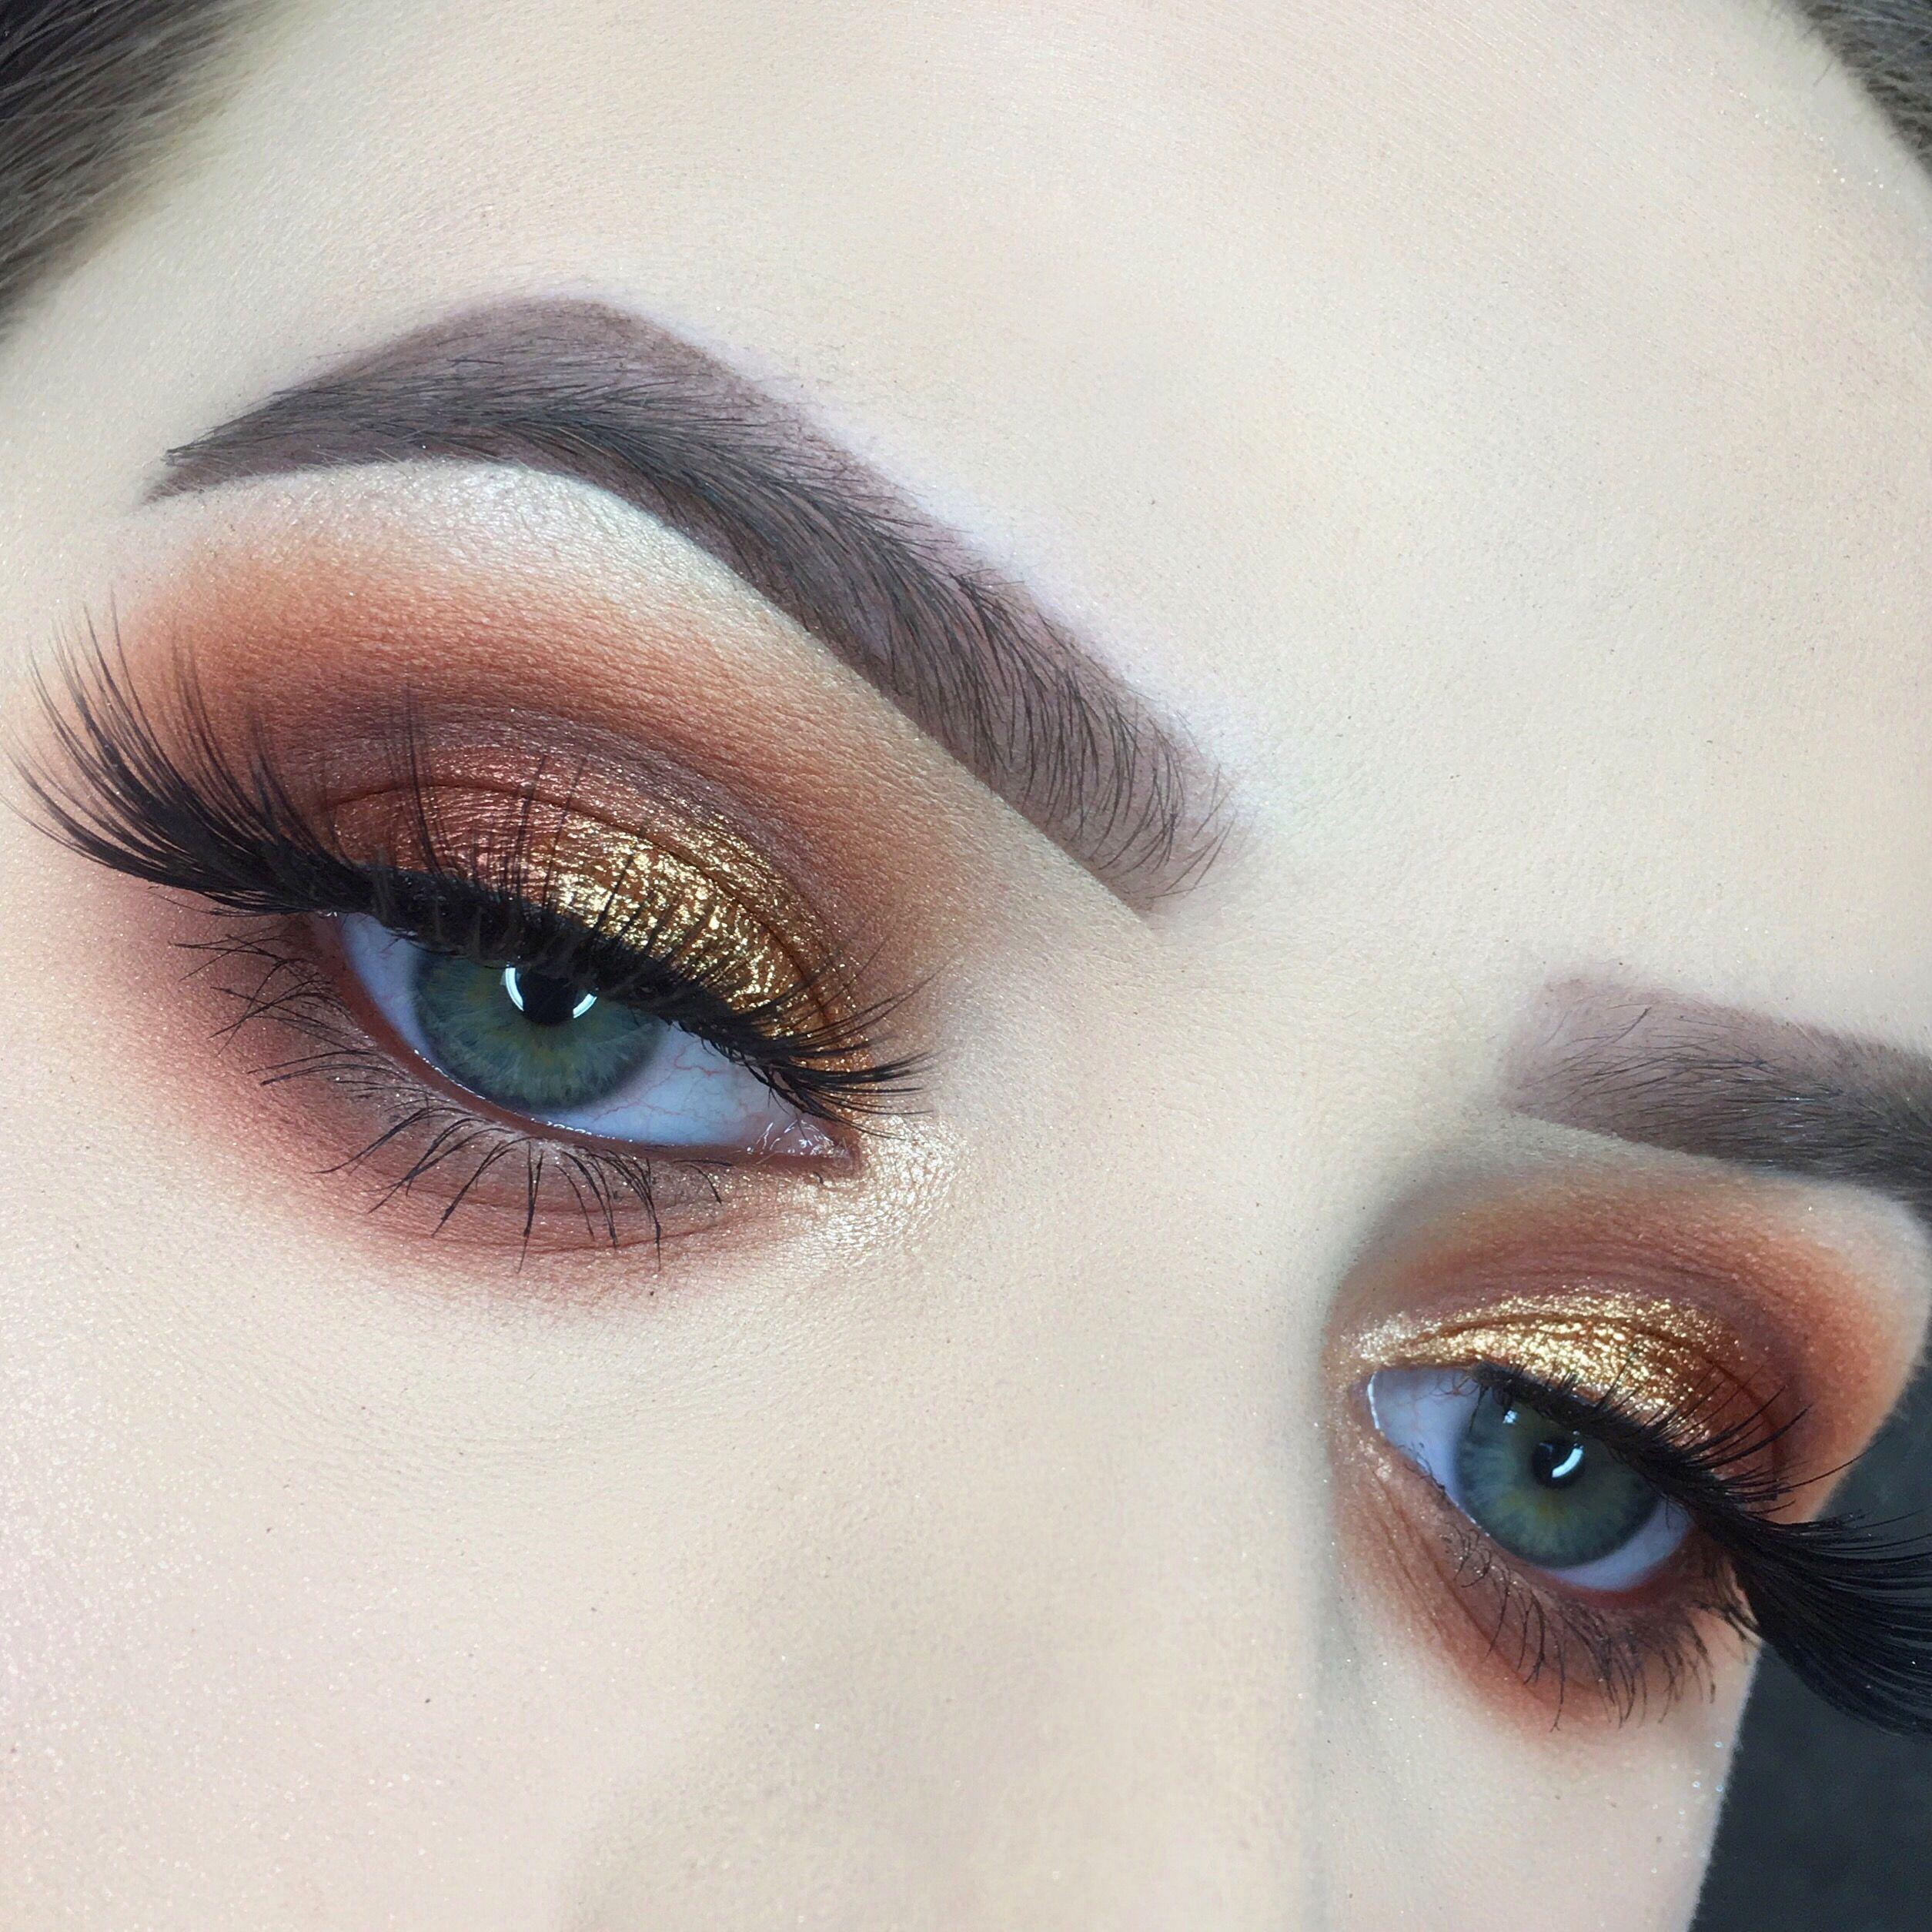 morphe 35O palette | Makeup in 2019 | Makeup, Eye makeup ...